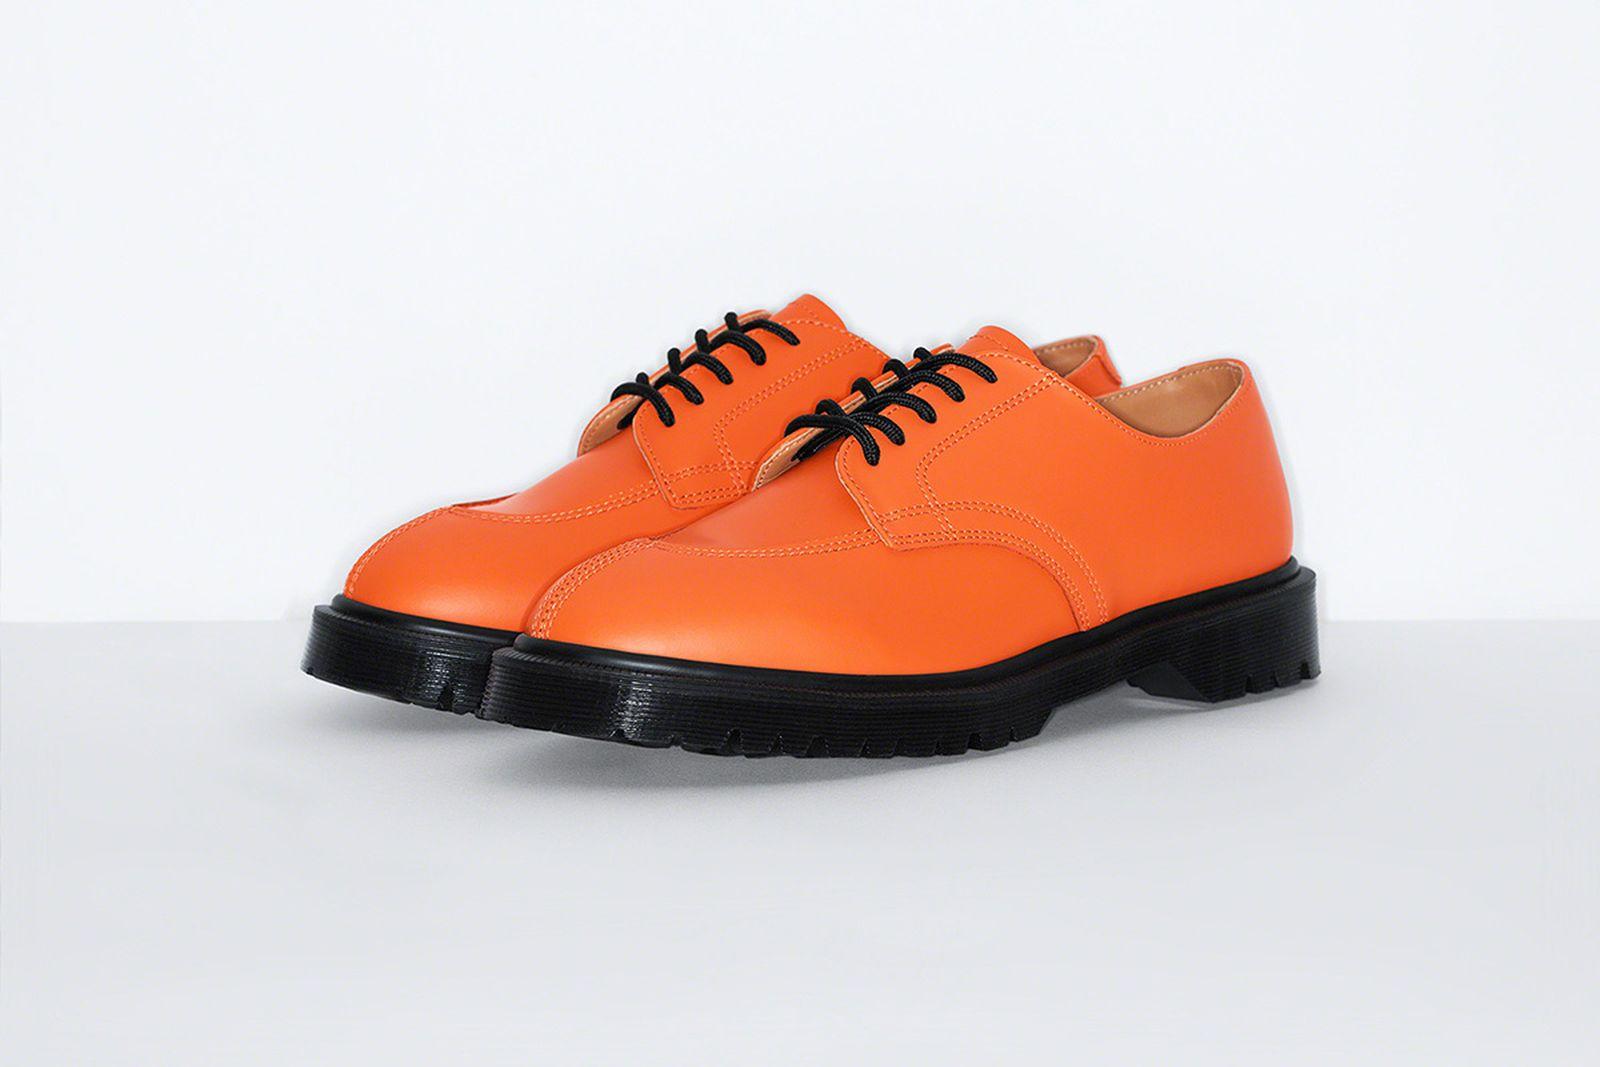 supreme-dr-martens-5-eye-shoe-release-date-price-05